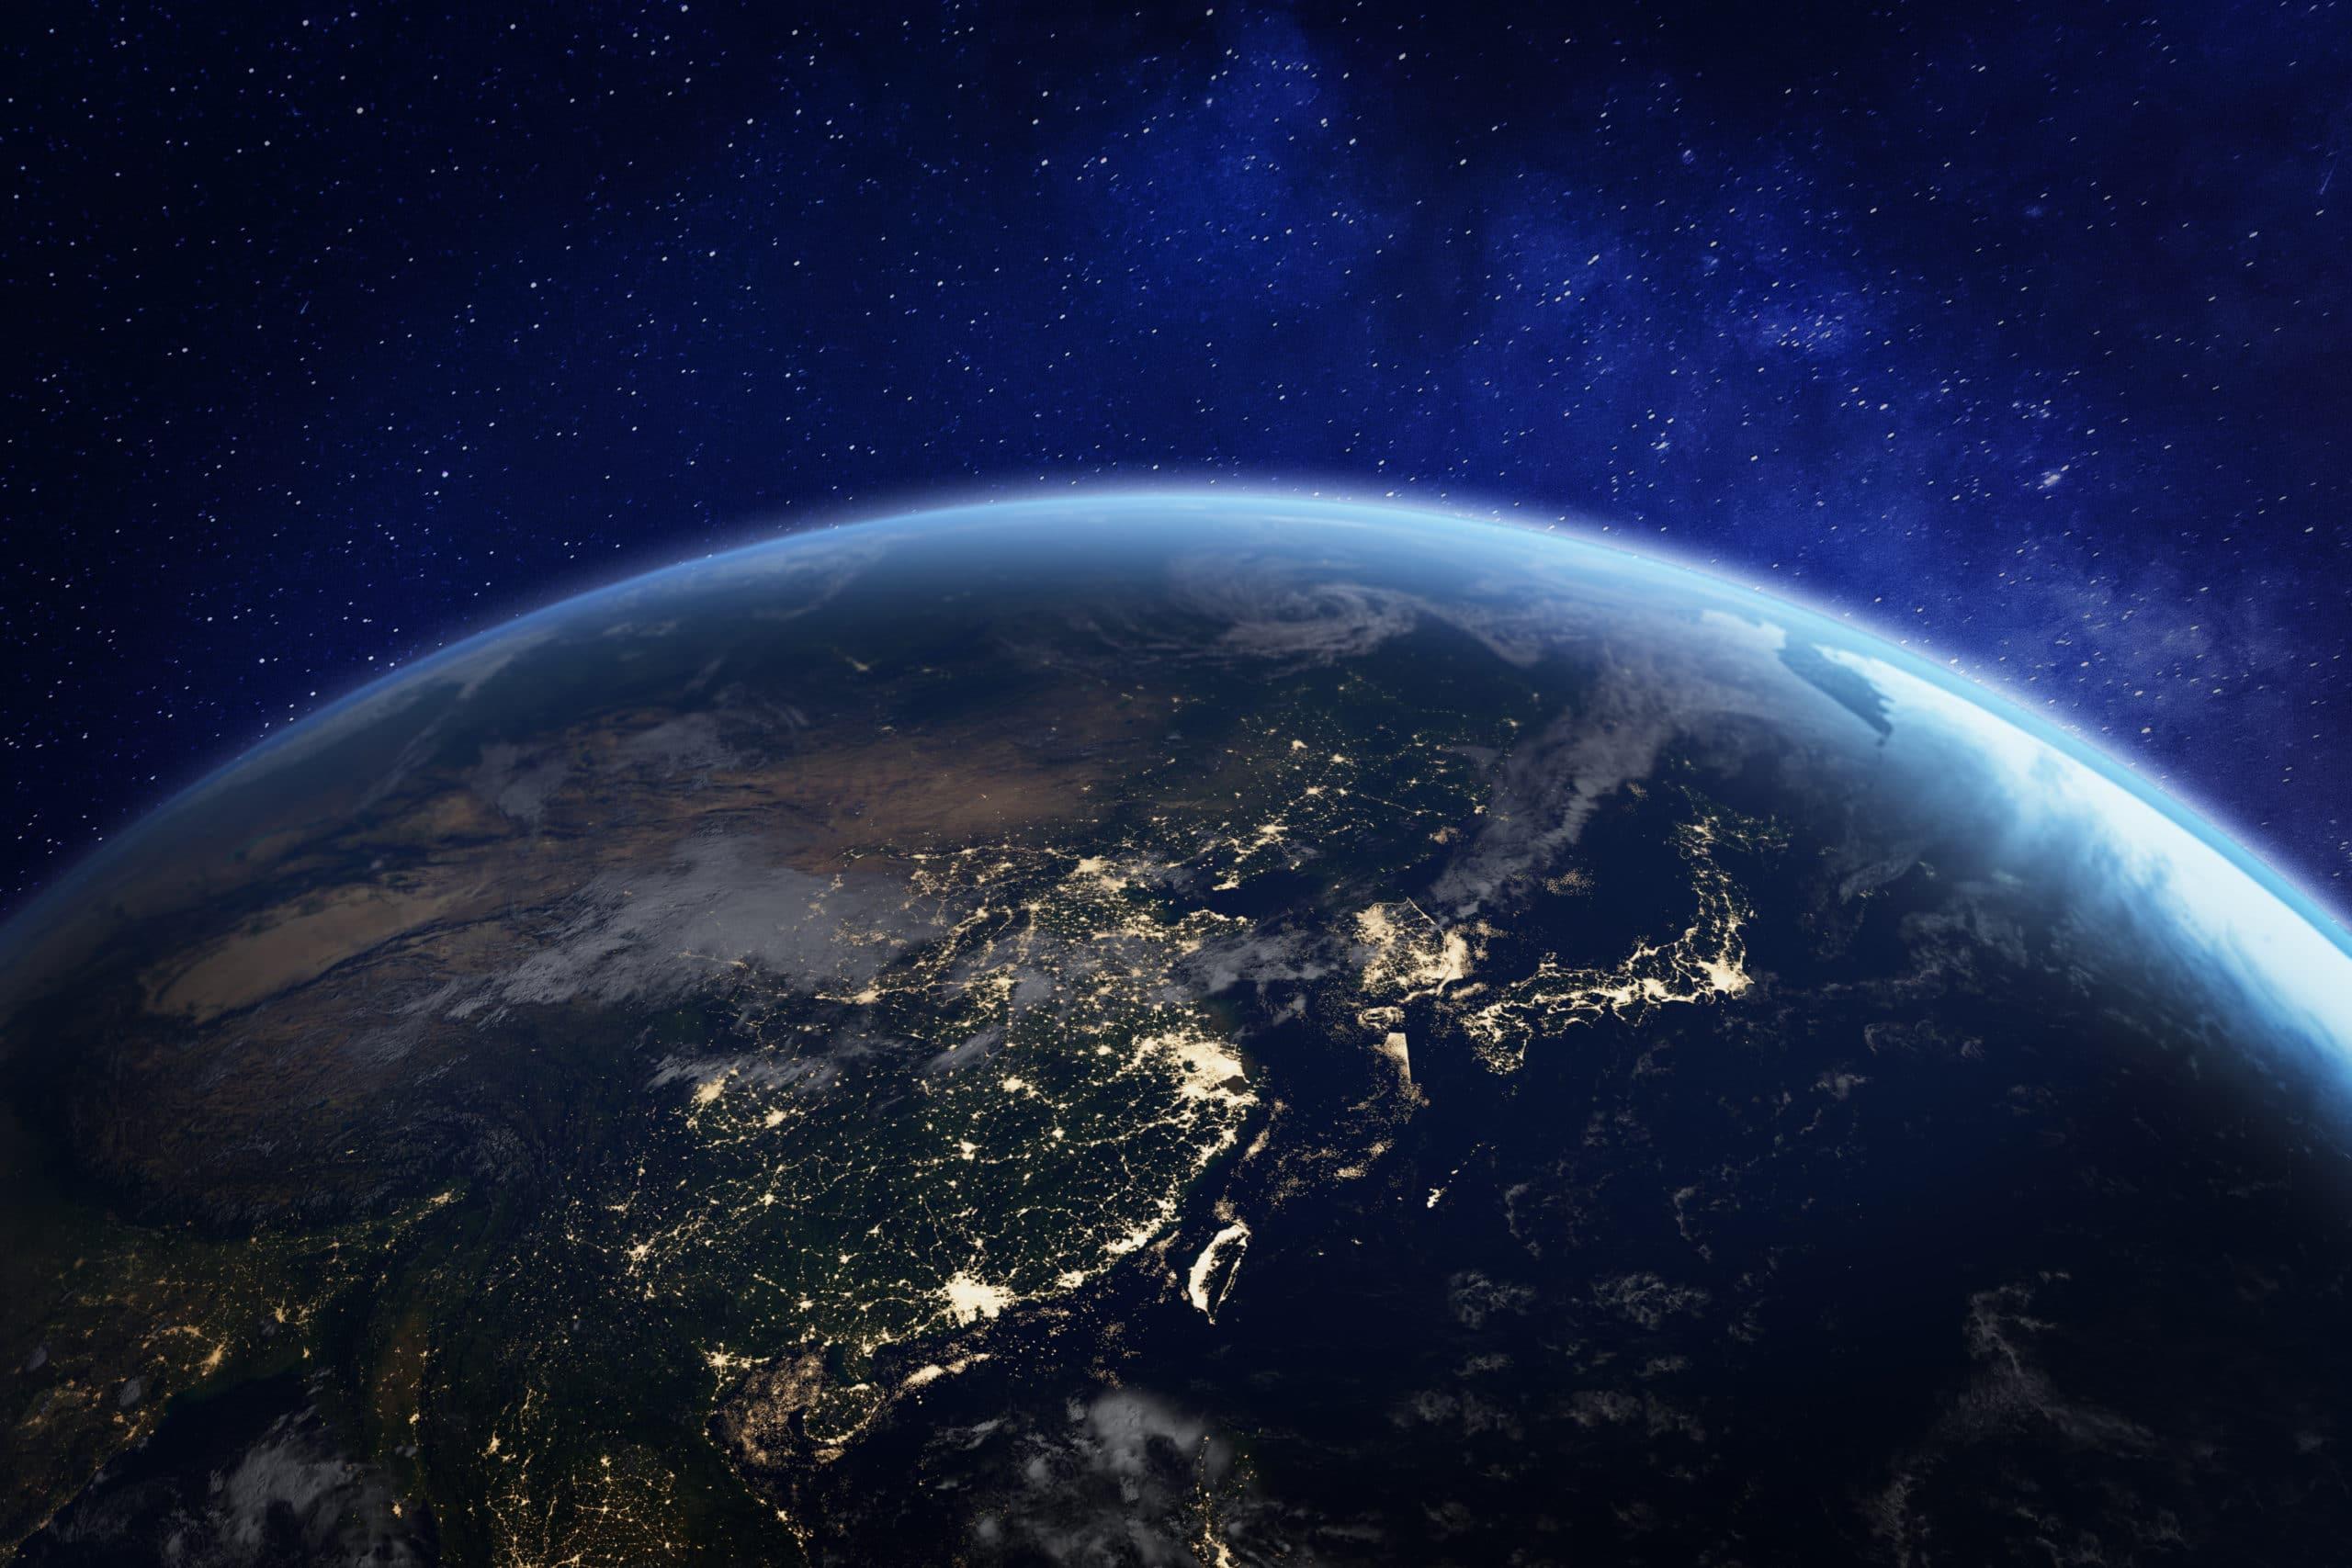 Planeta Terra (globo) visto do espaço